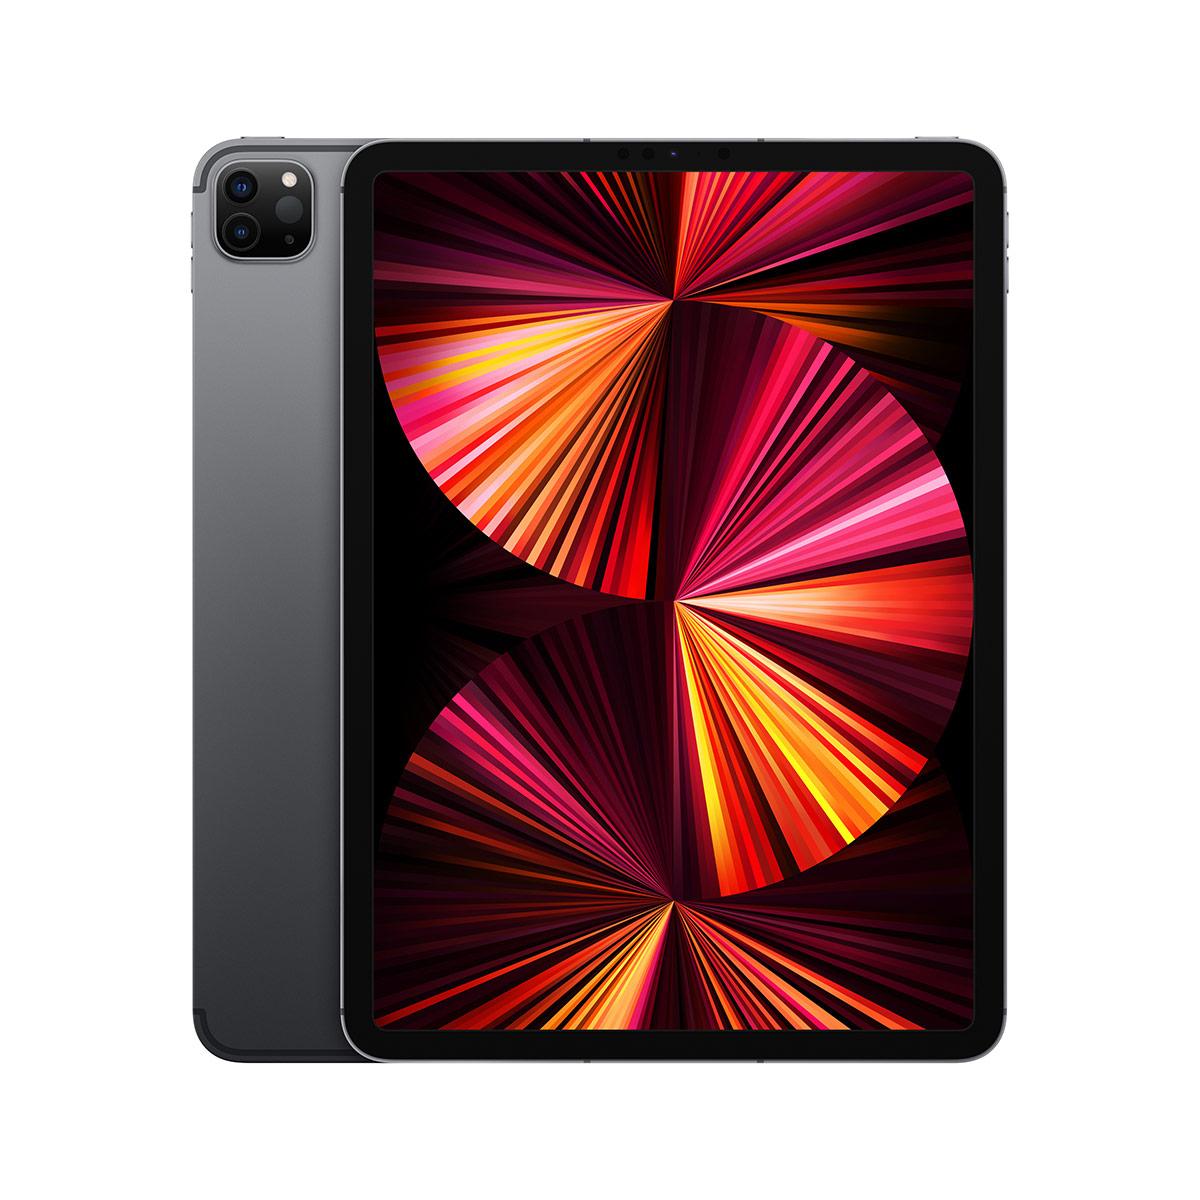 "Education iPad Pro 12.9"" 2TB WiFi + Cellular M1 Chip ..."